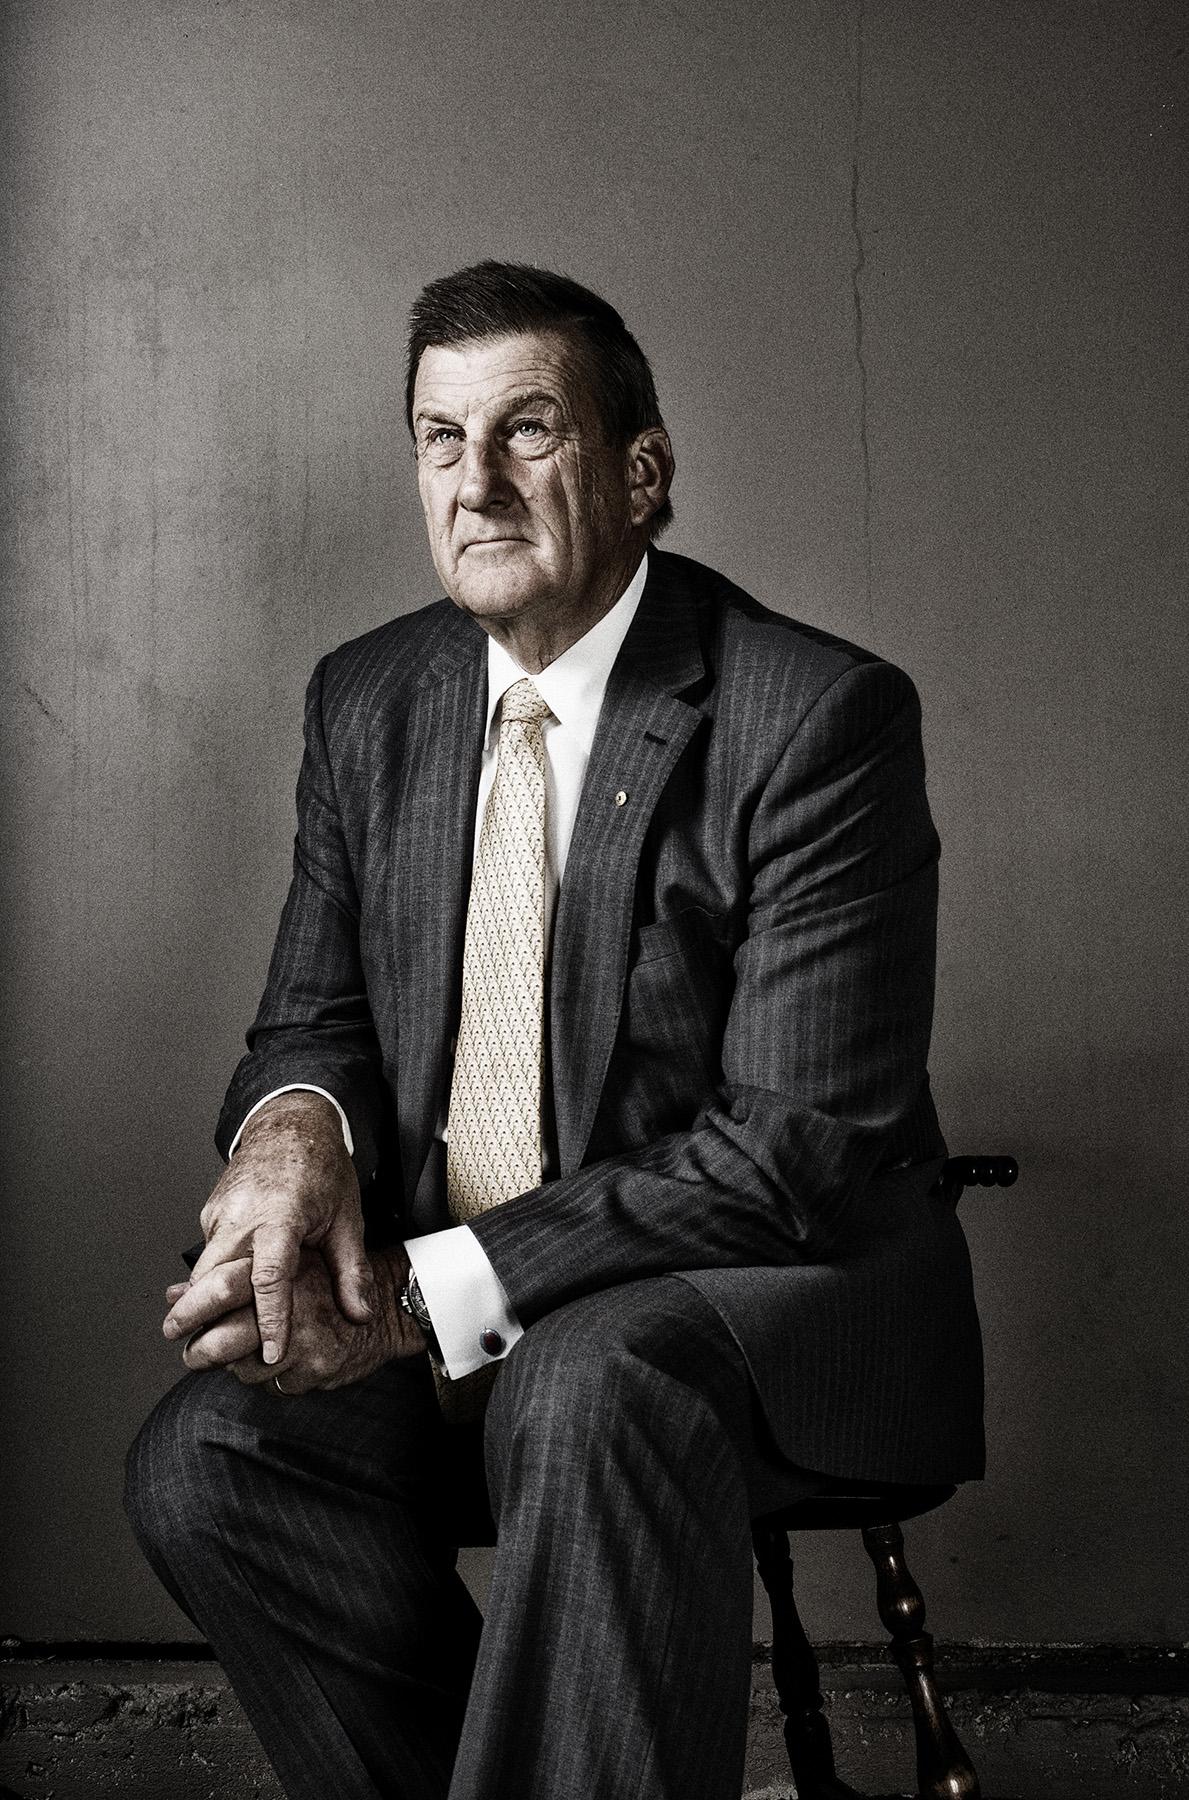 Former Victorian Premier - Jeff Kennett